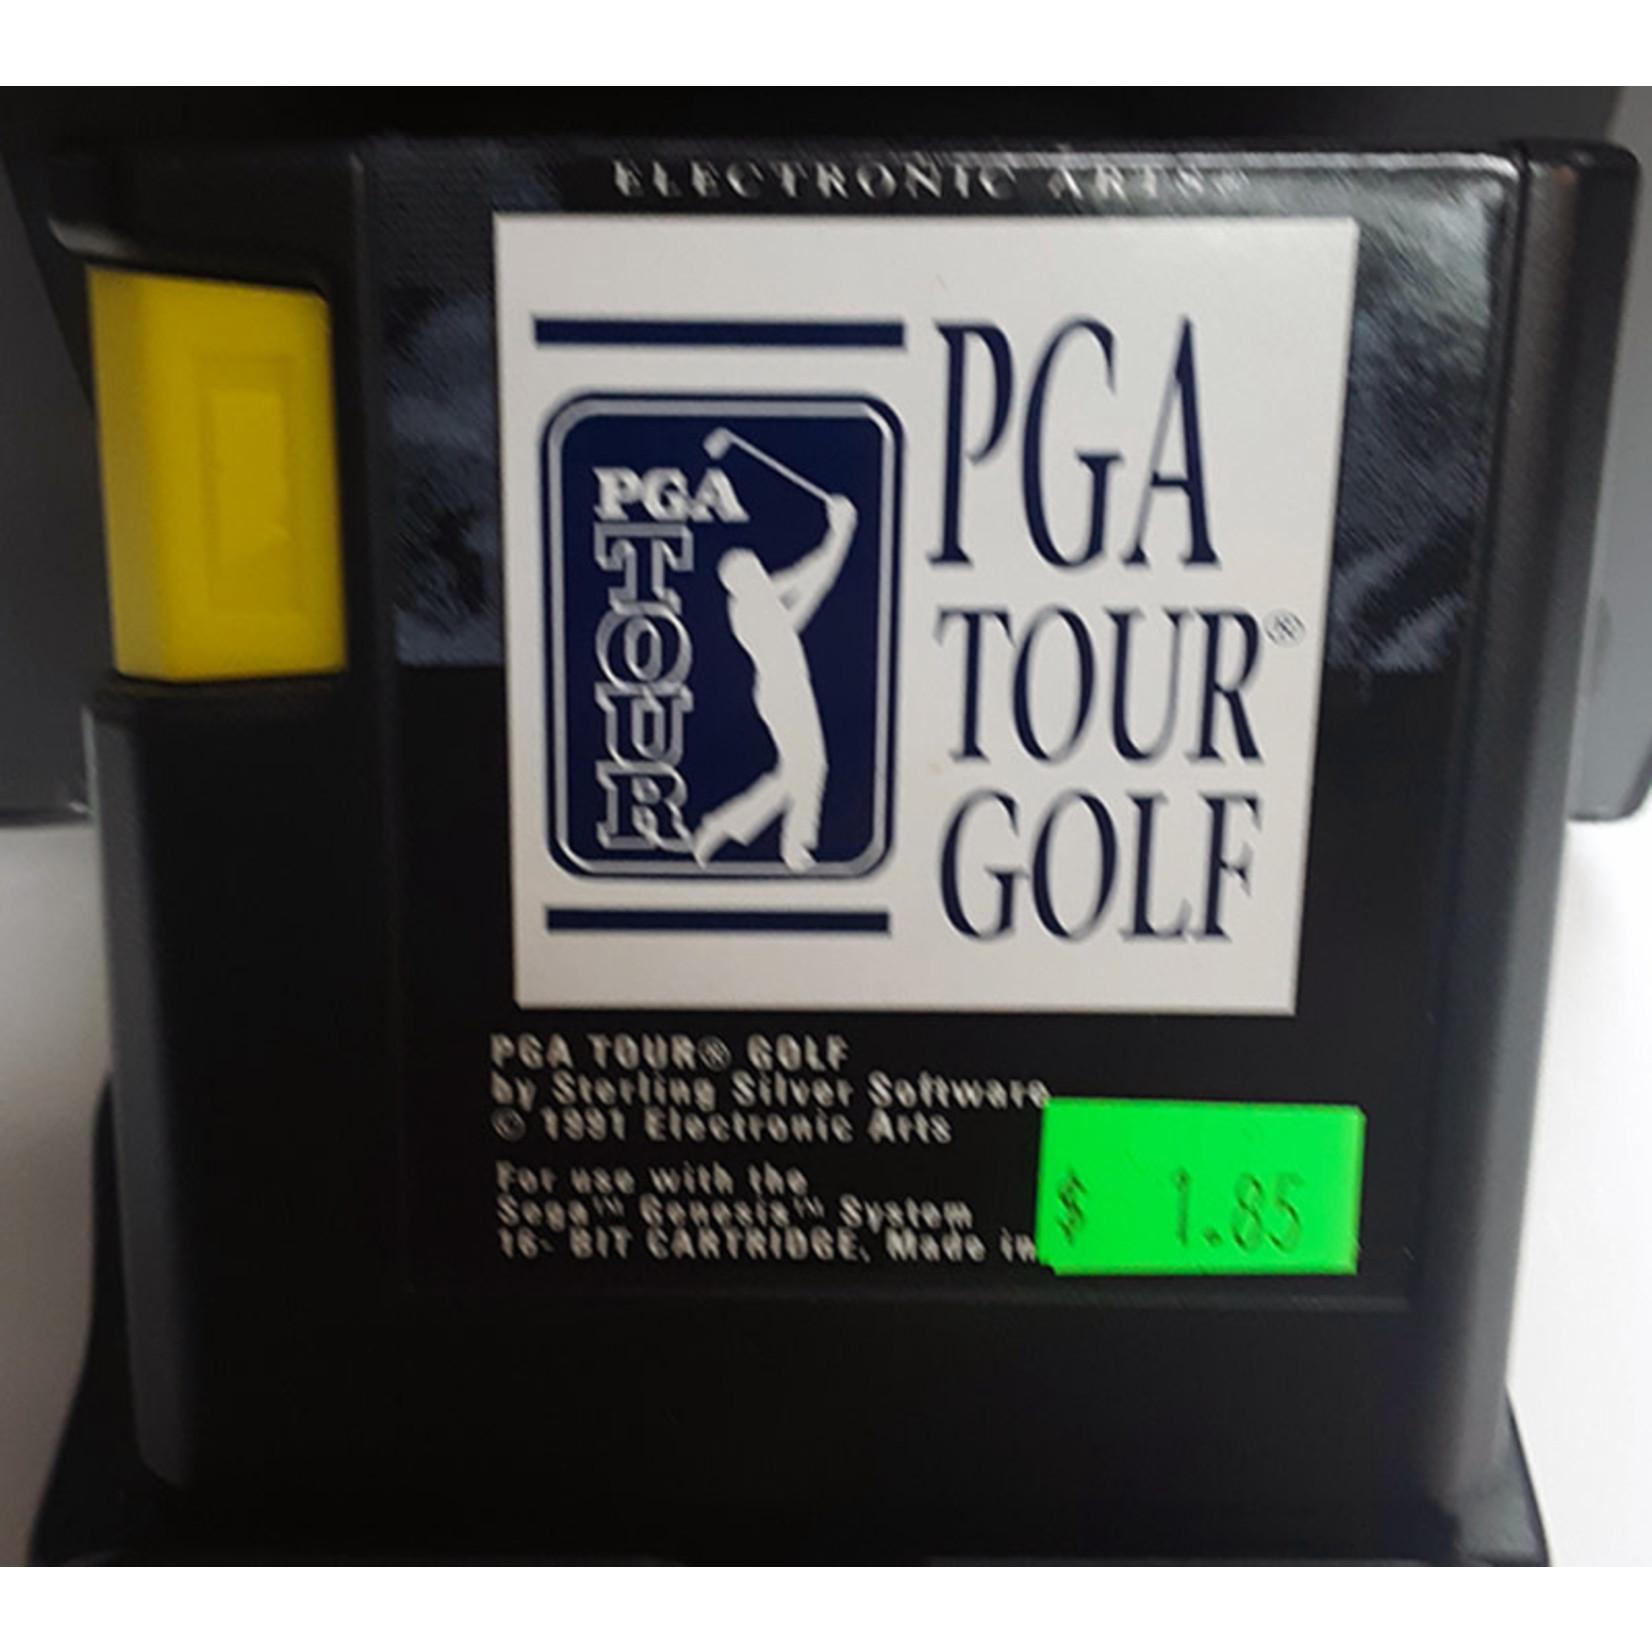 sgu-PGA Tour Golf (cartridge)